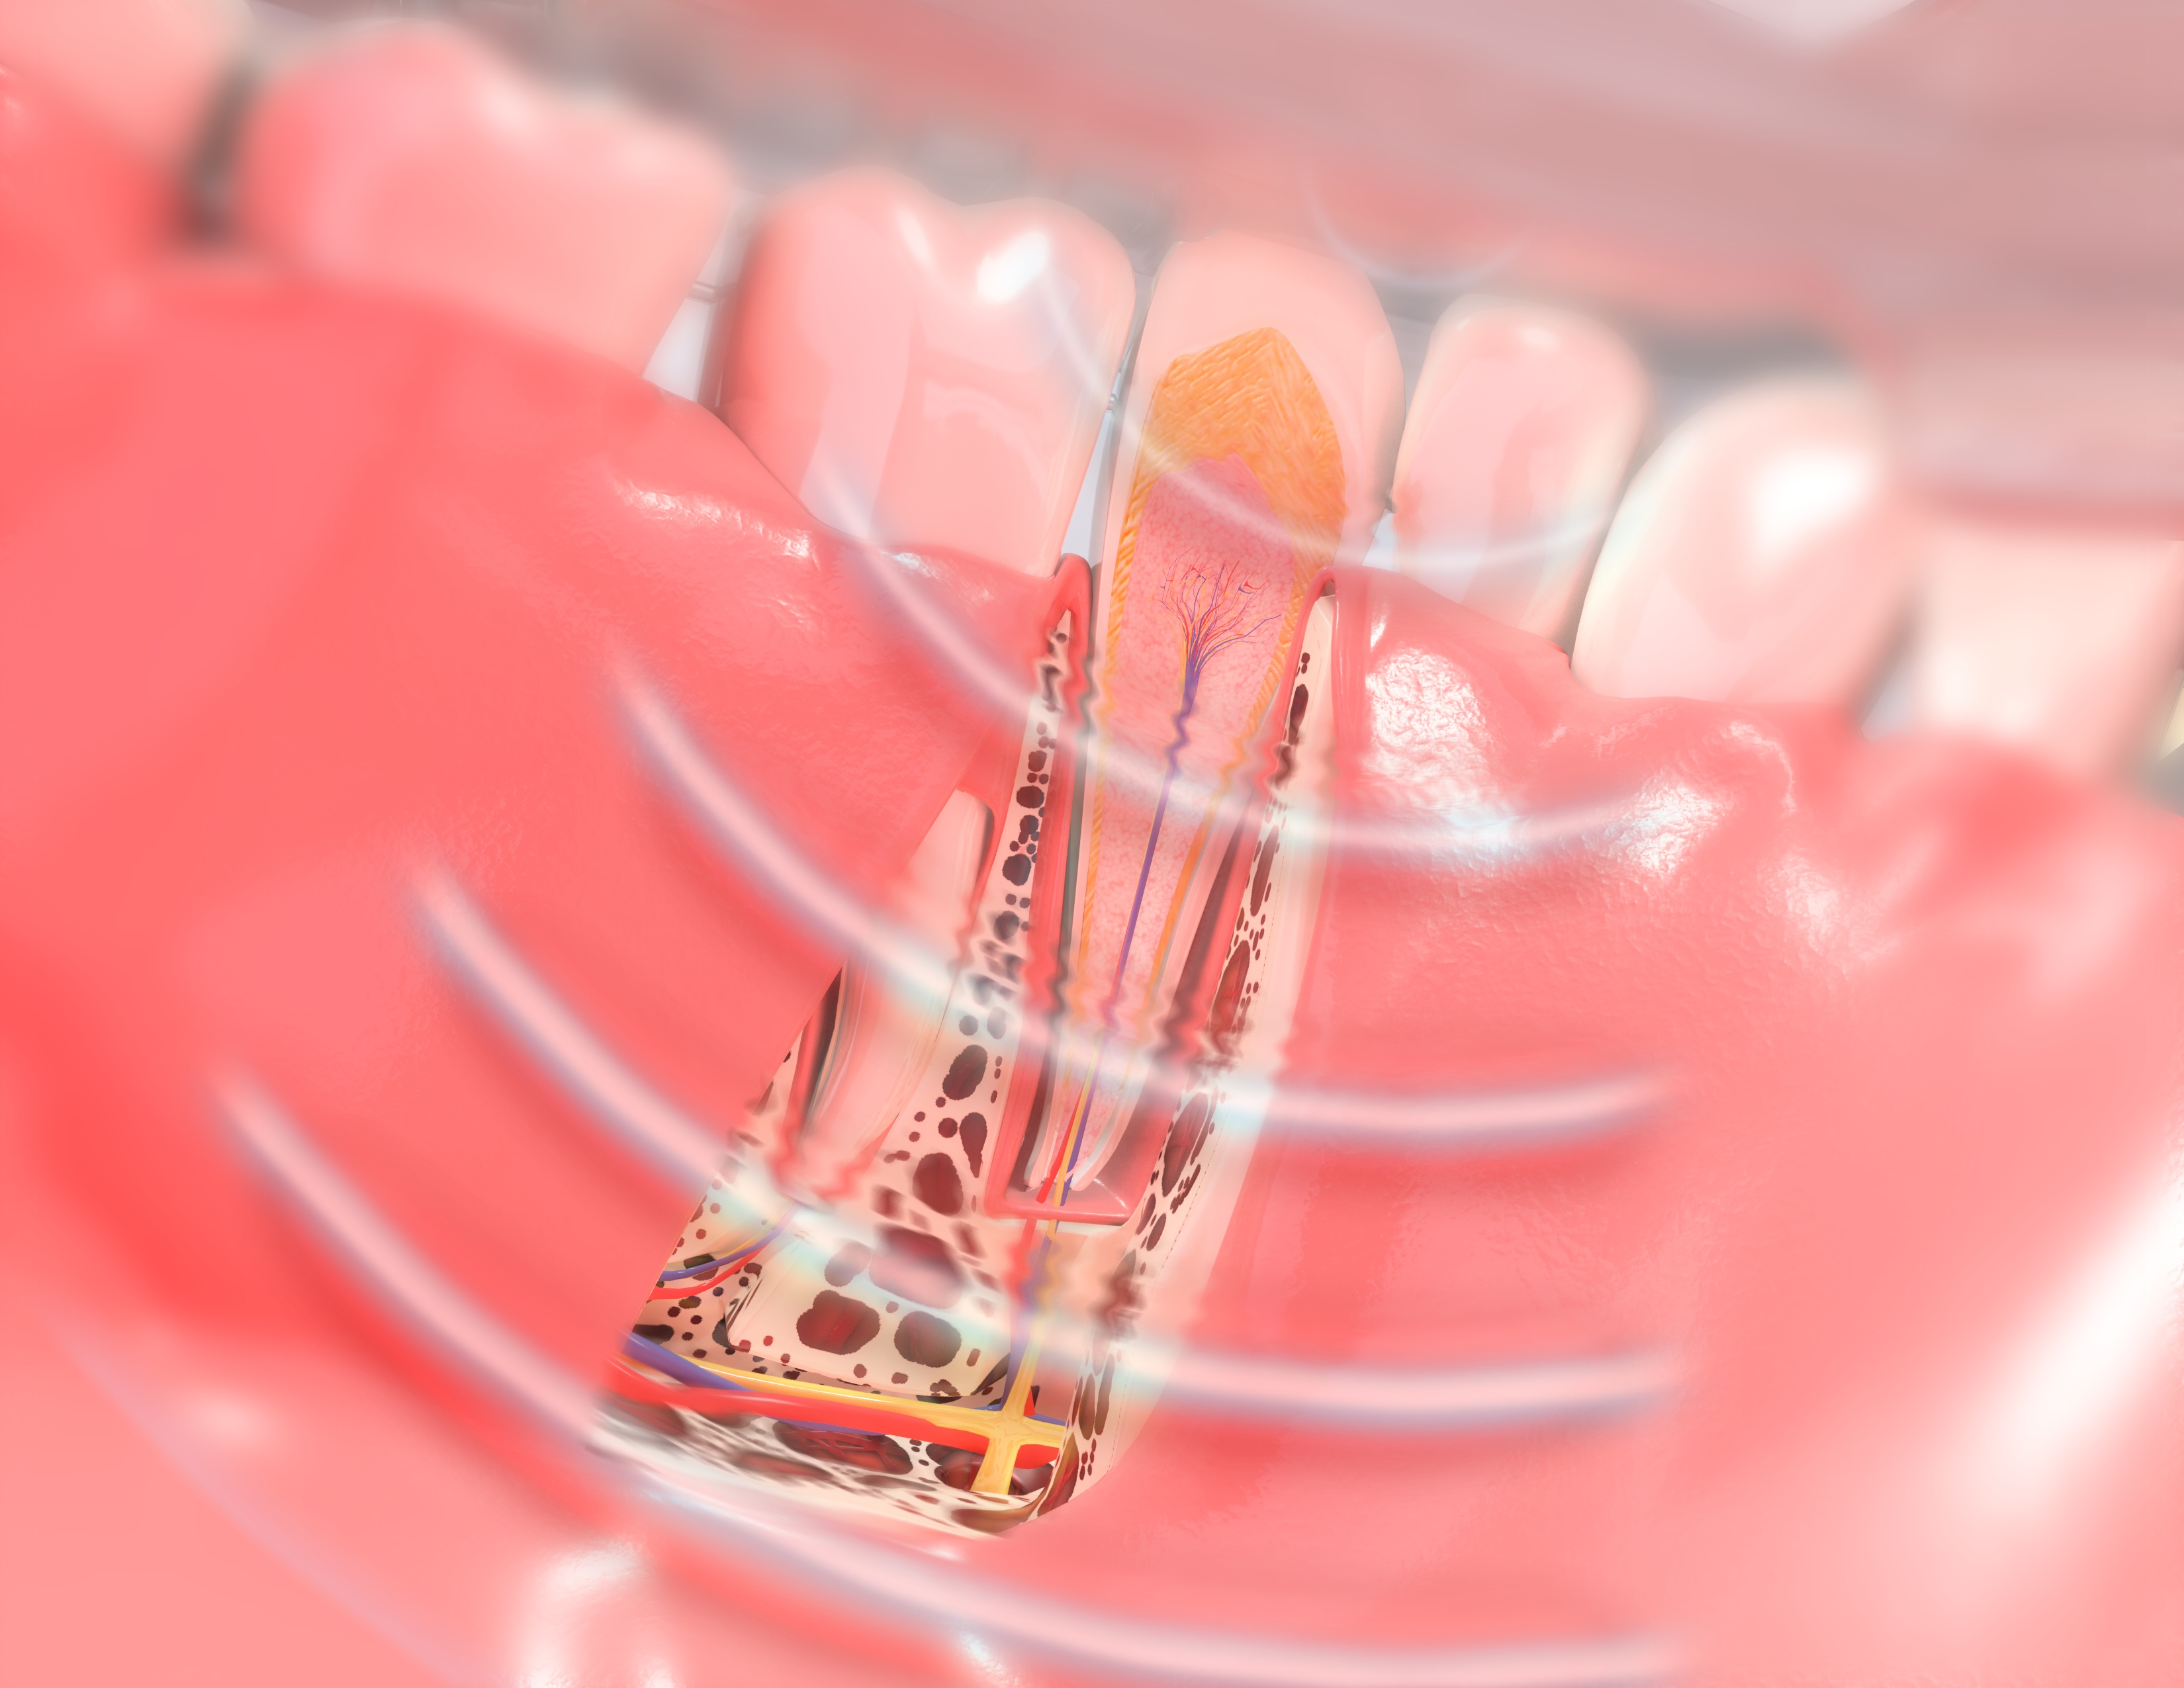 SoftPulse Technology at Berkman & Shapiro Orthodontics, Commerce Township, MI 48382